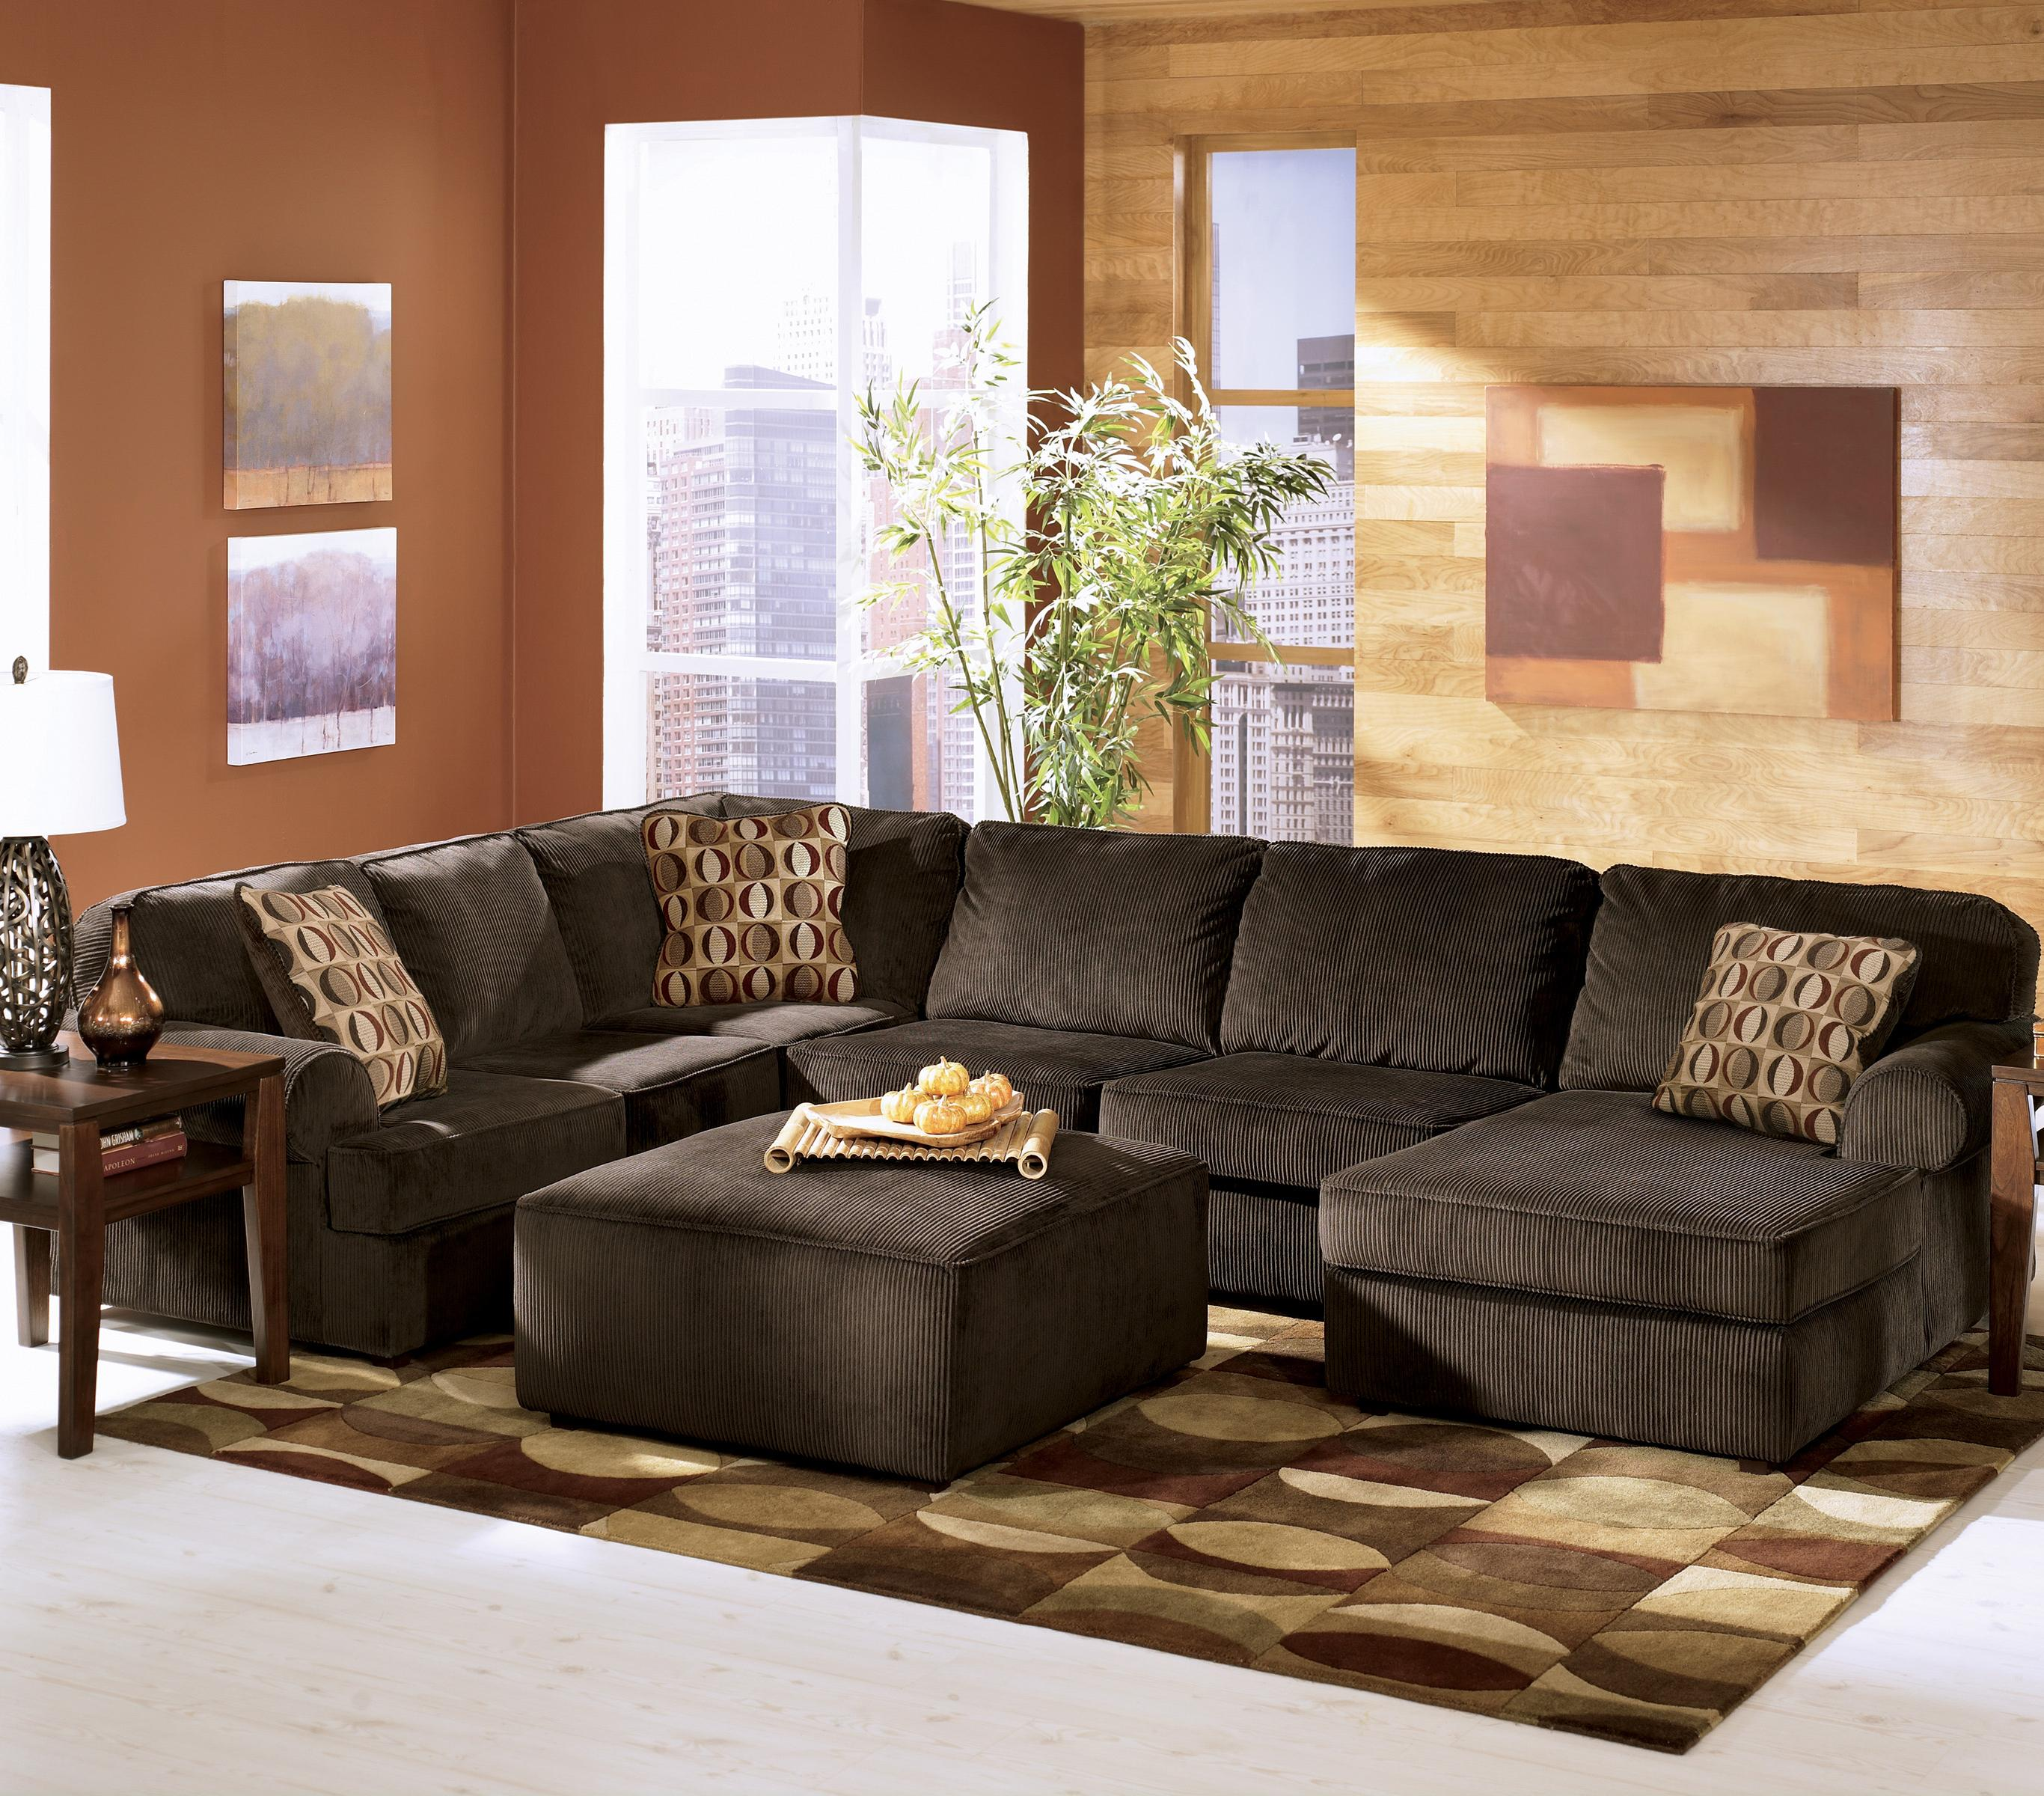 Ashley Furniture Vista Chocolate Casual 3 Piece